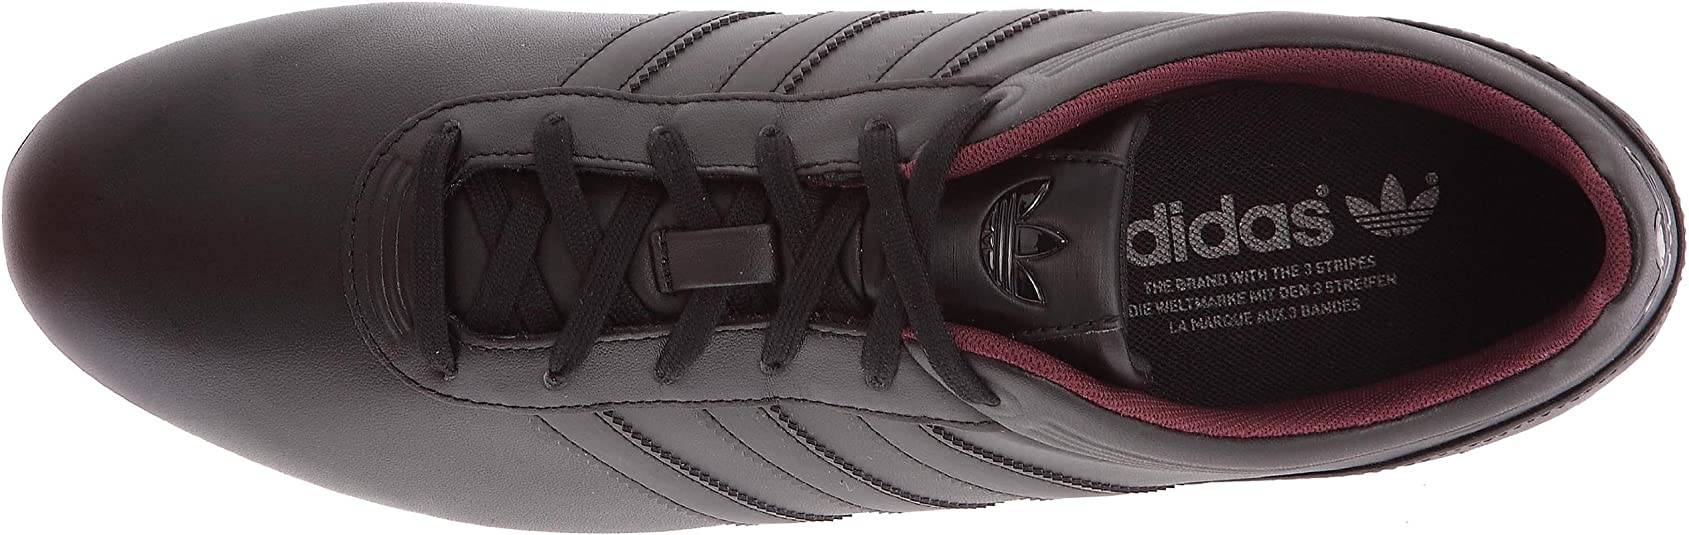 Acheter > basket adidas zx 750 > OFF 41% |